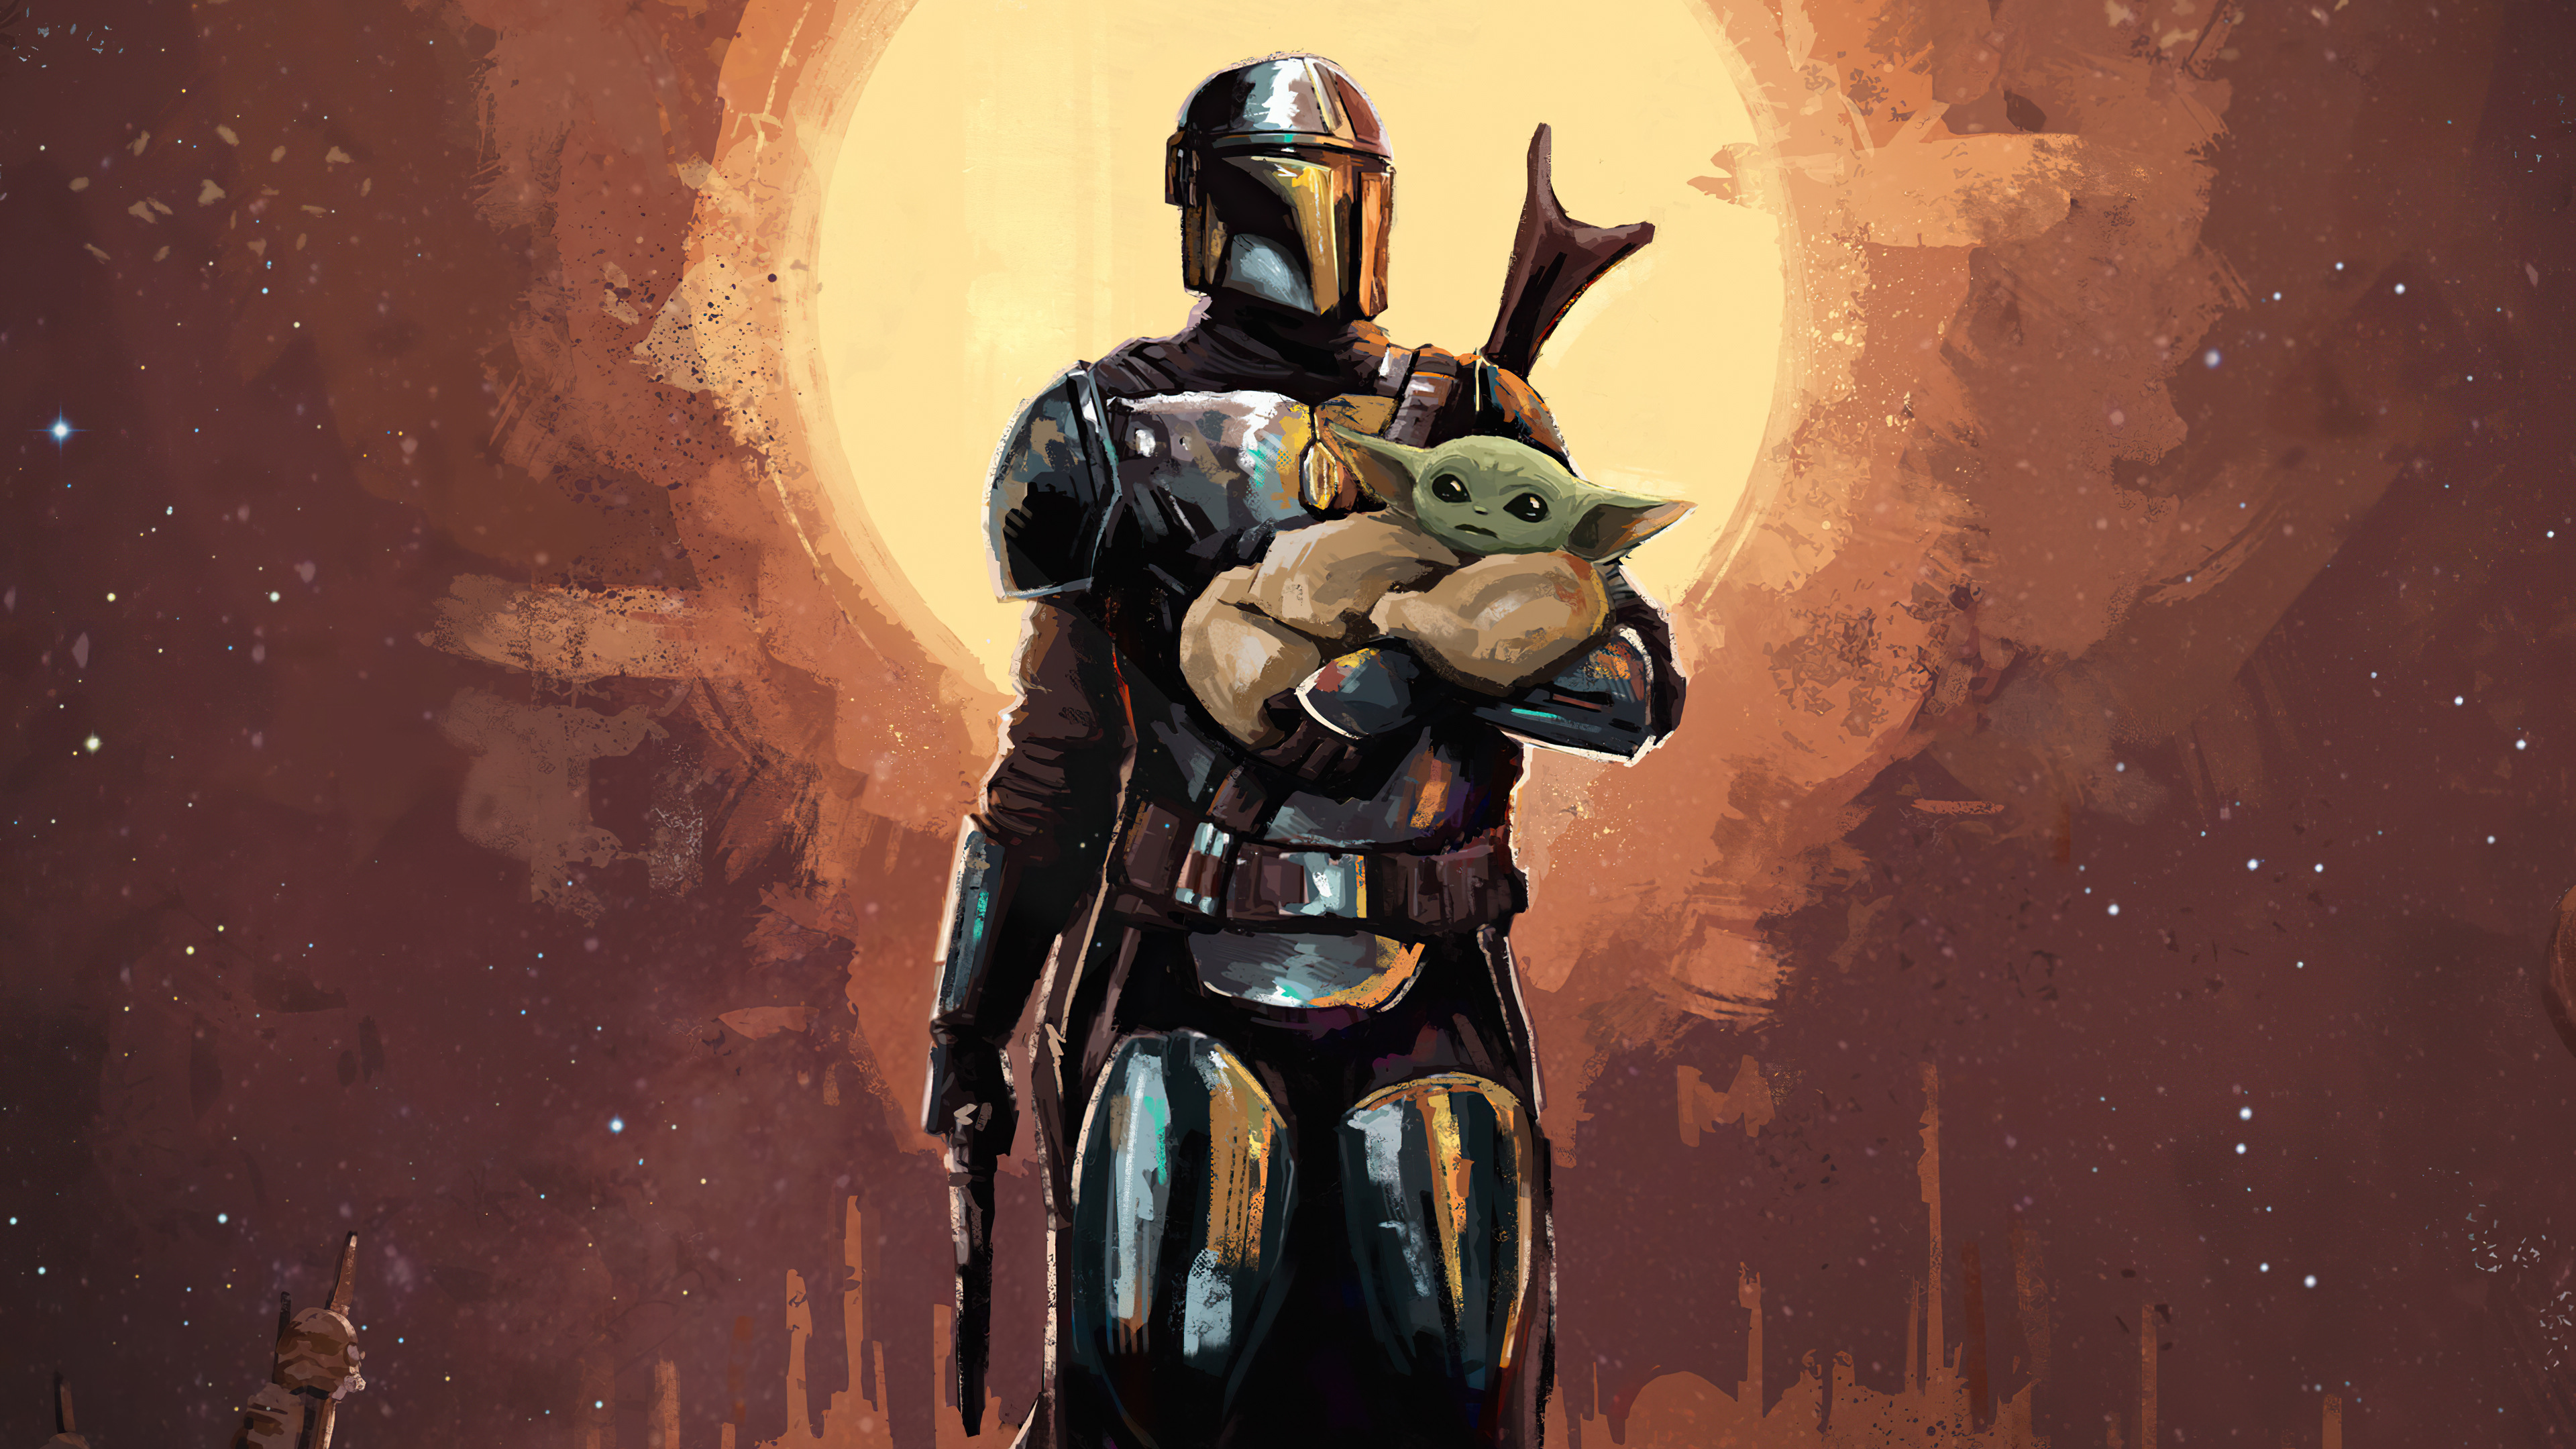 Fondos de pantalla The Manddalorian Yoda bebe Arte Digital